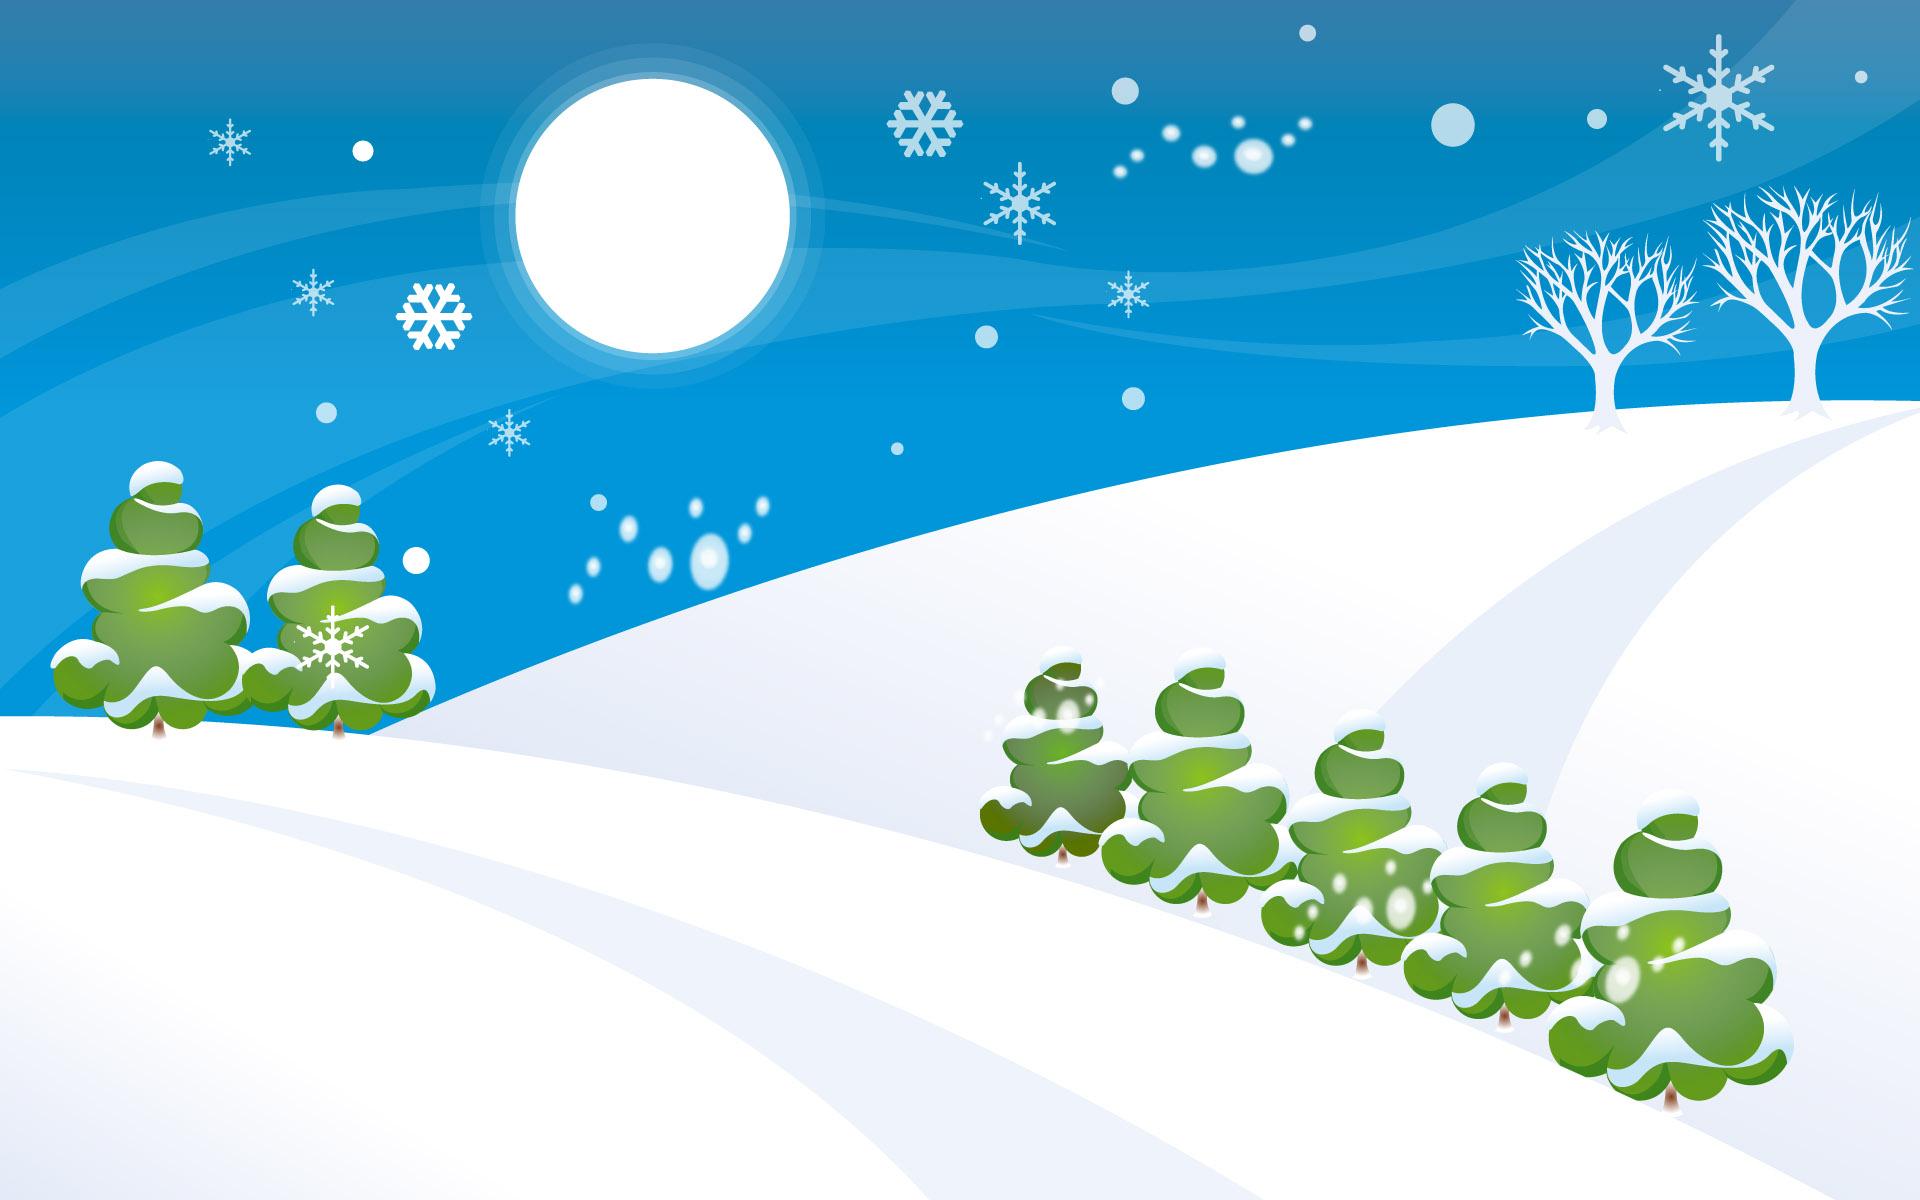 Free Animated Christmas Wallpaper for Desktop (4)